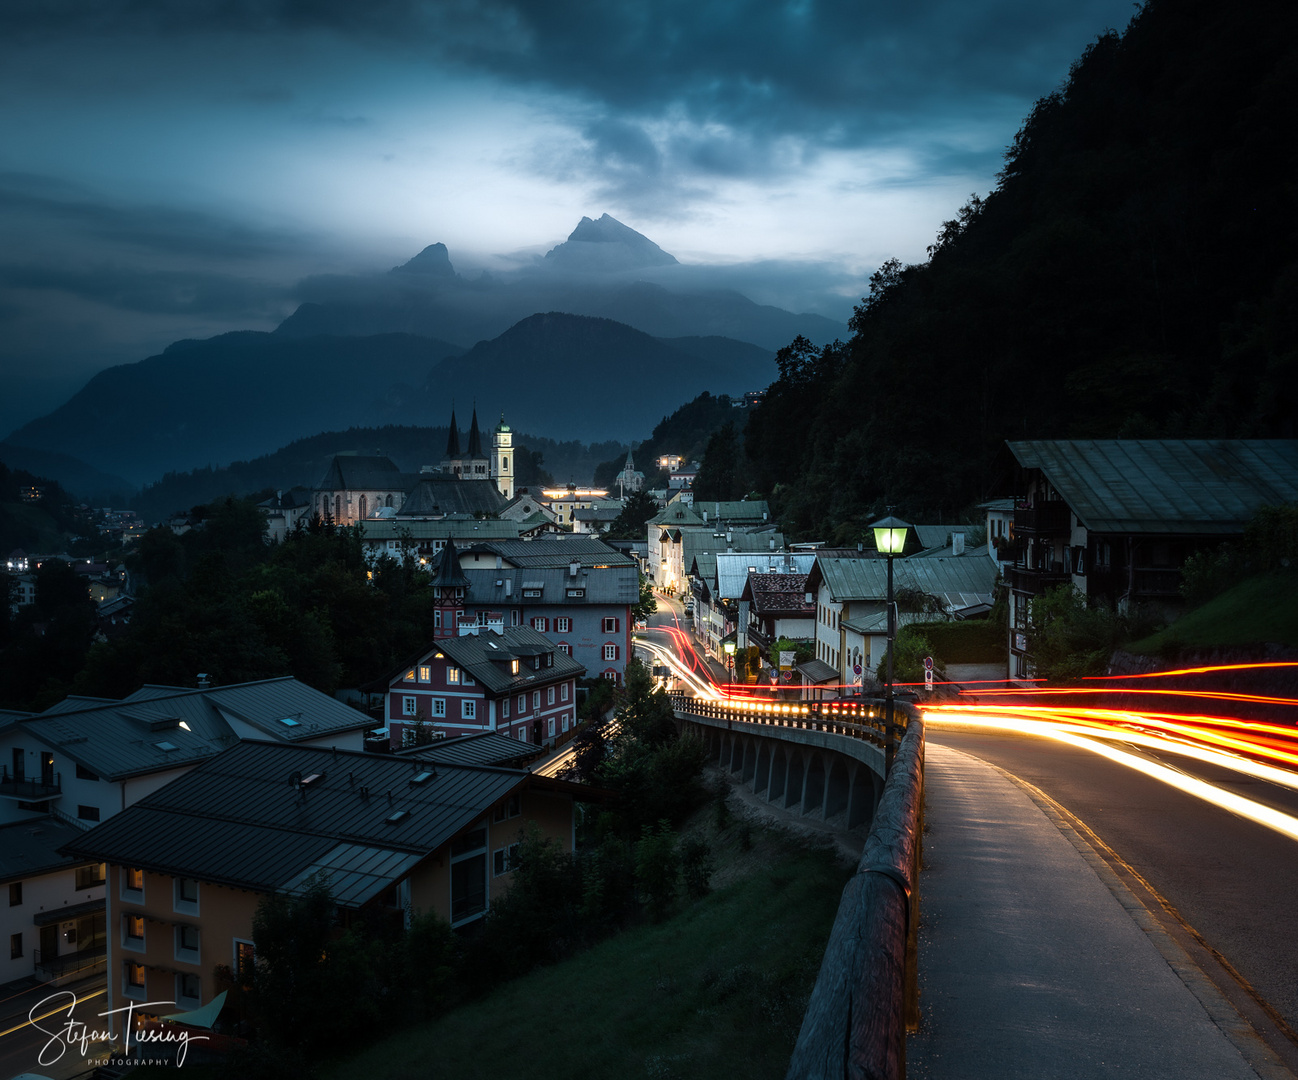 Down to Berchtesgaden